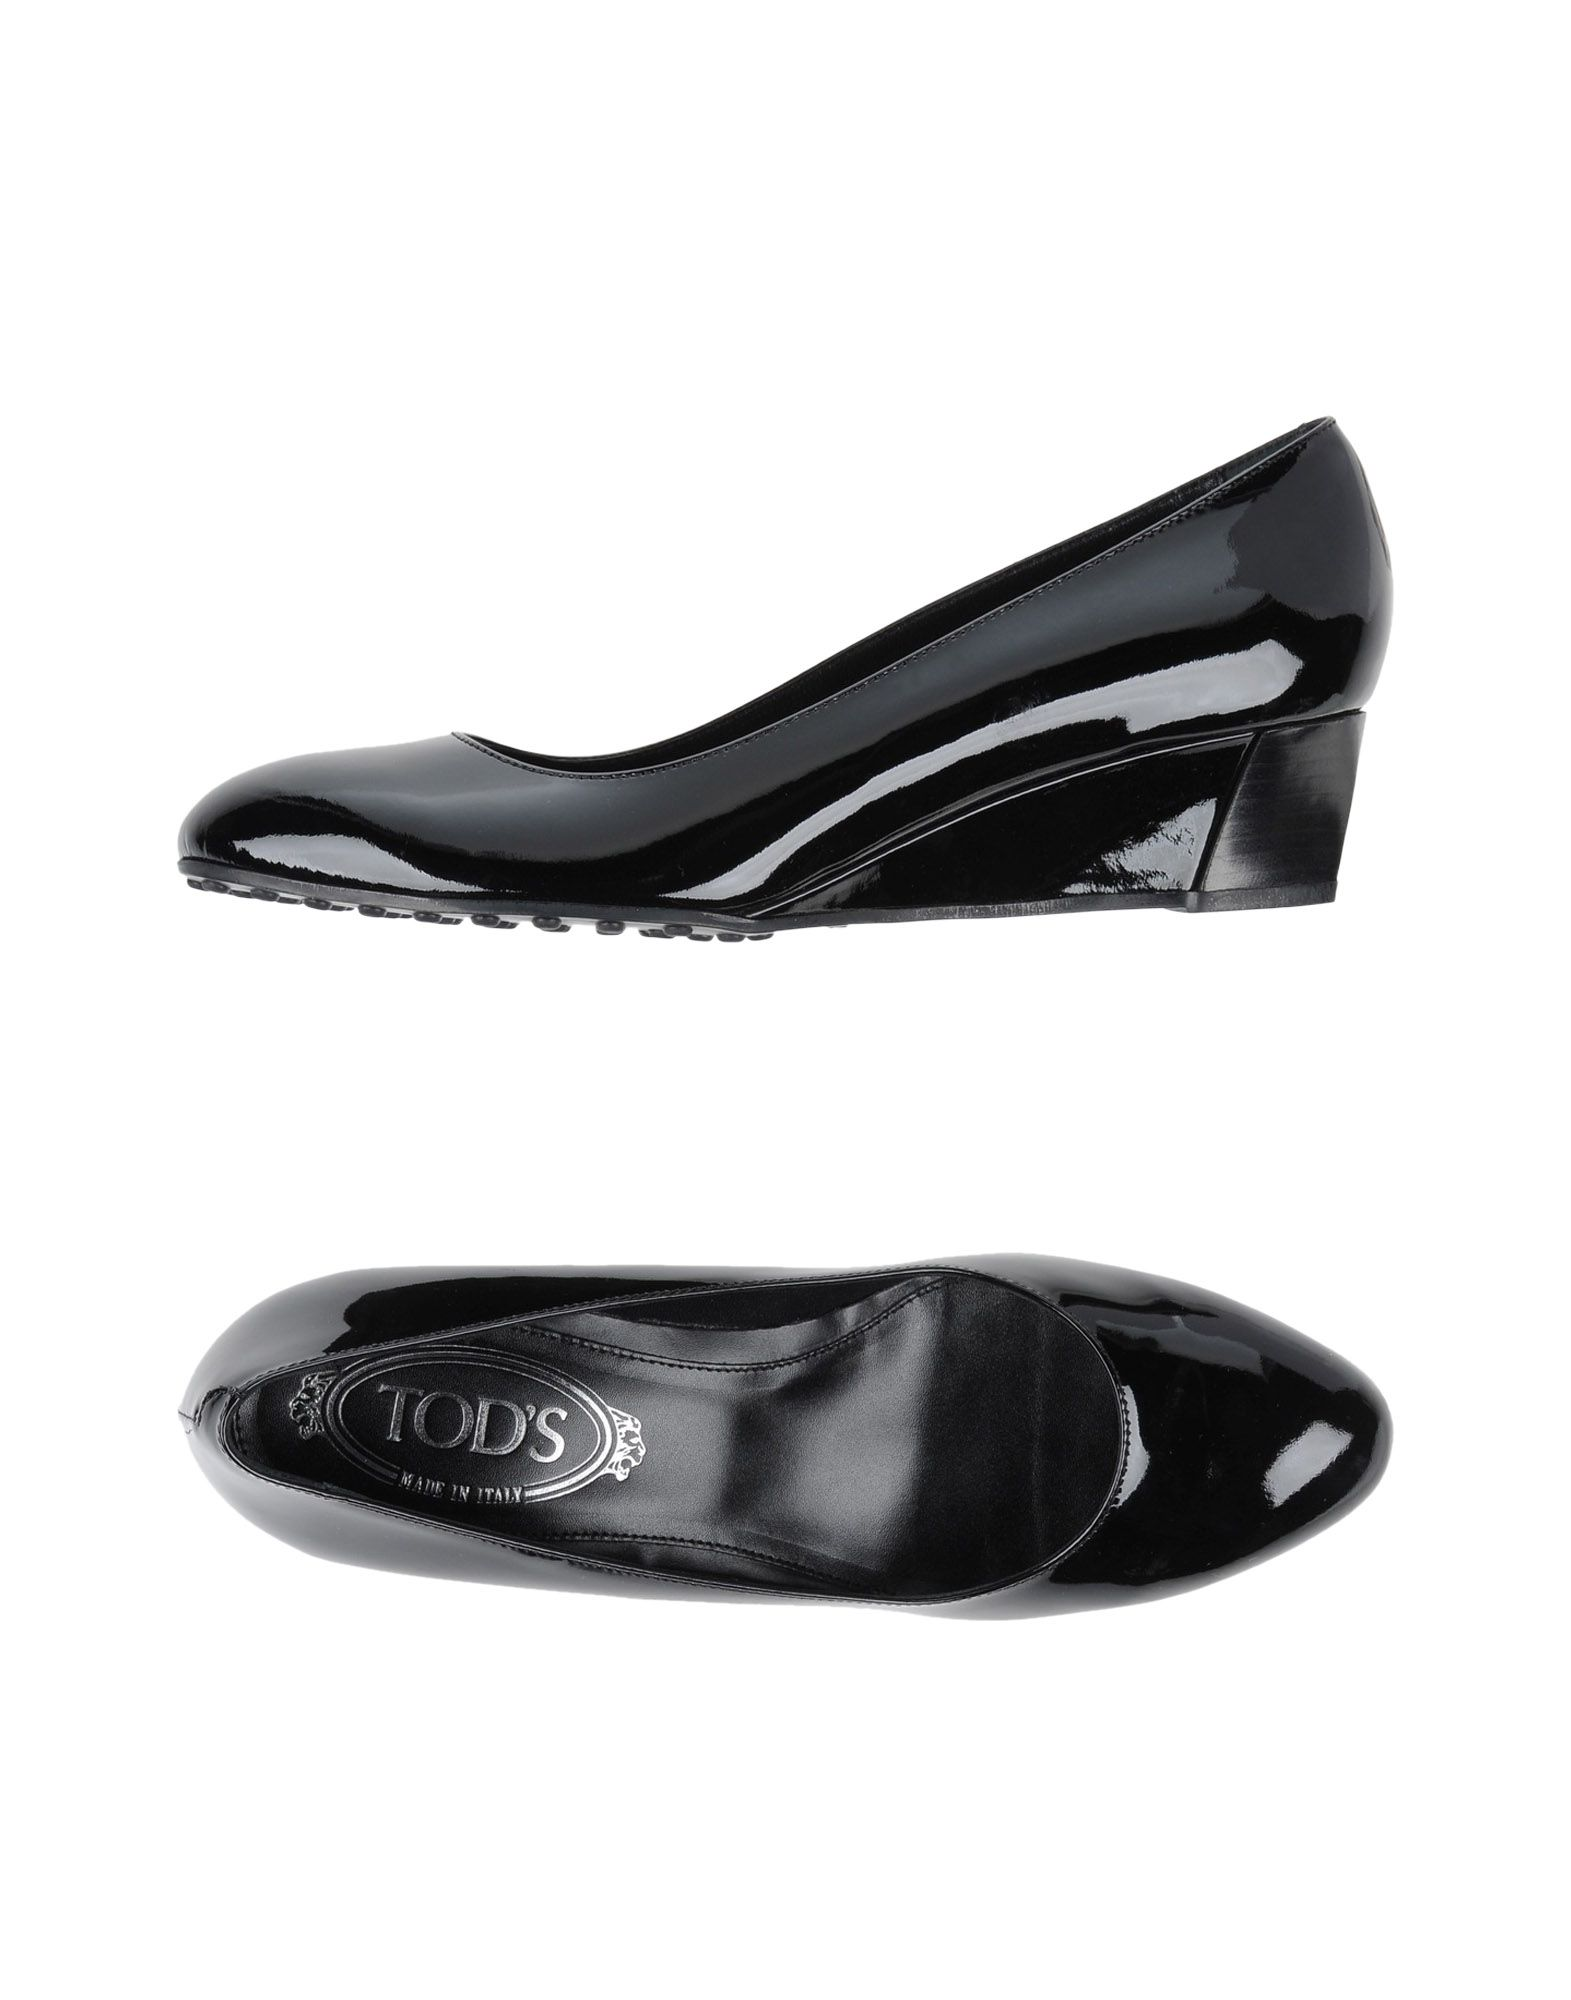 Haltbare Mode billige Schuhe Tod's Pumps Damen  11285438CN Heiße Schuhe